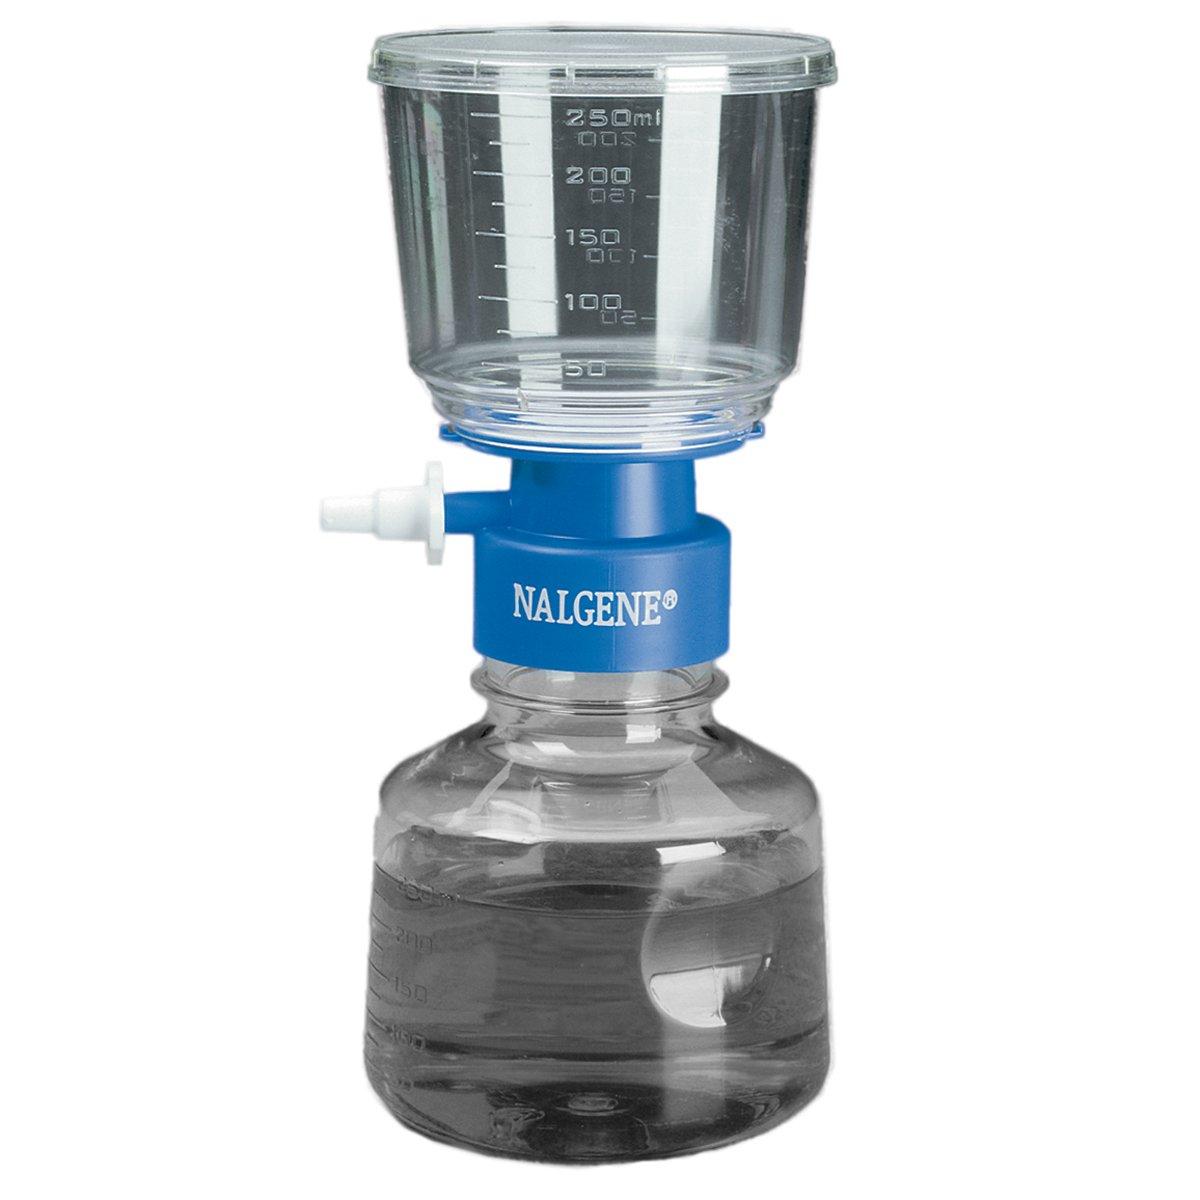 Nalgene MF75 series Polystyrene Lab Bottletop Filter, Fits 33mm Neck, Sterile, Graduated, Side Arm Adapter, Blue Collar, 0.45 Micron, 75mm Membrane Diameter, 500mL Capacity (Case of 12) by Nalgene